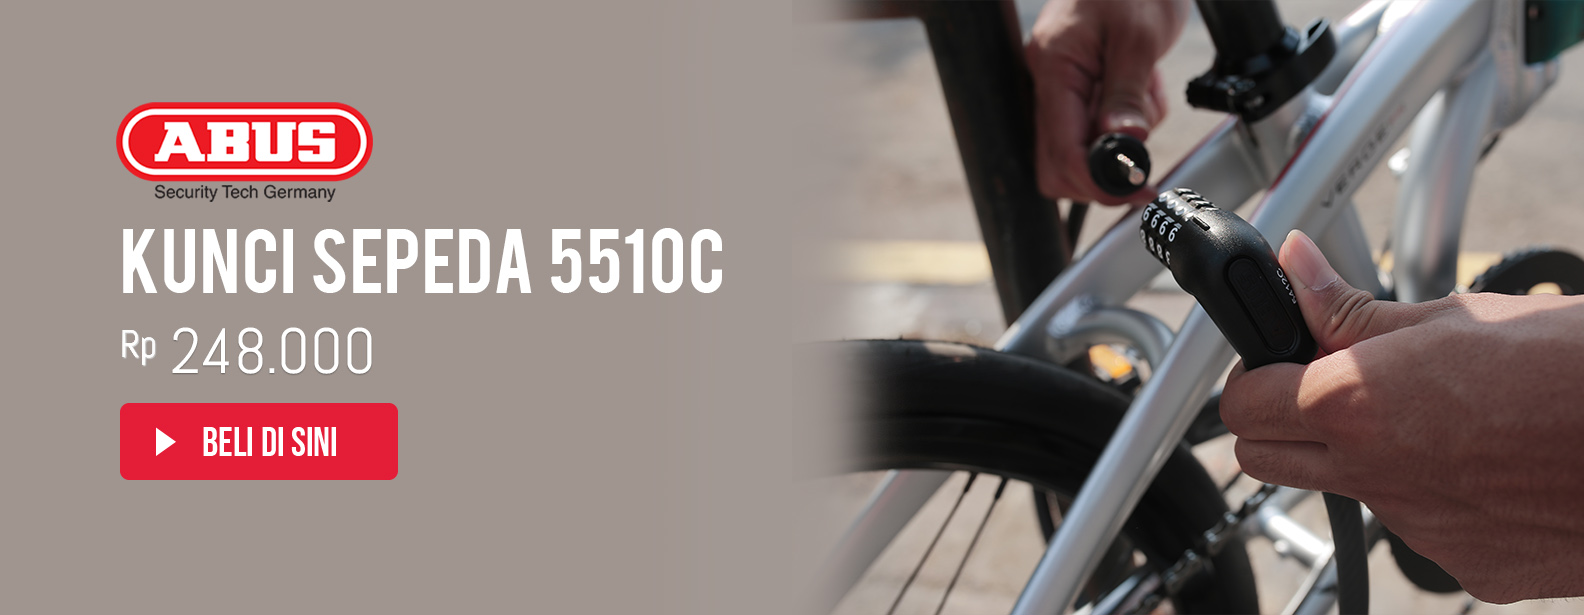 Abus Kunci Sepeda 5510C